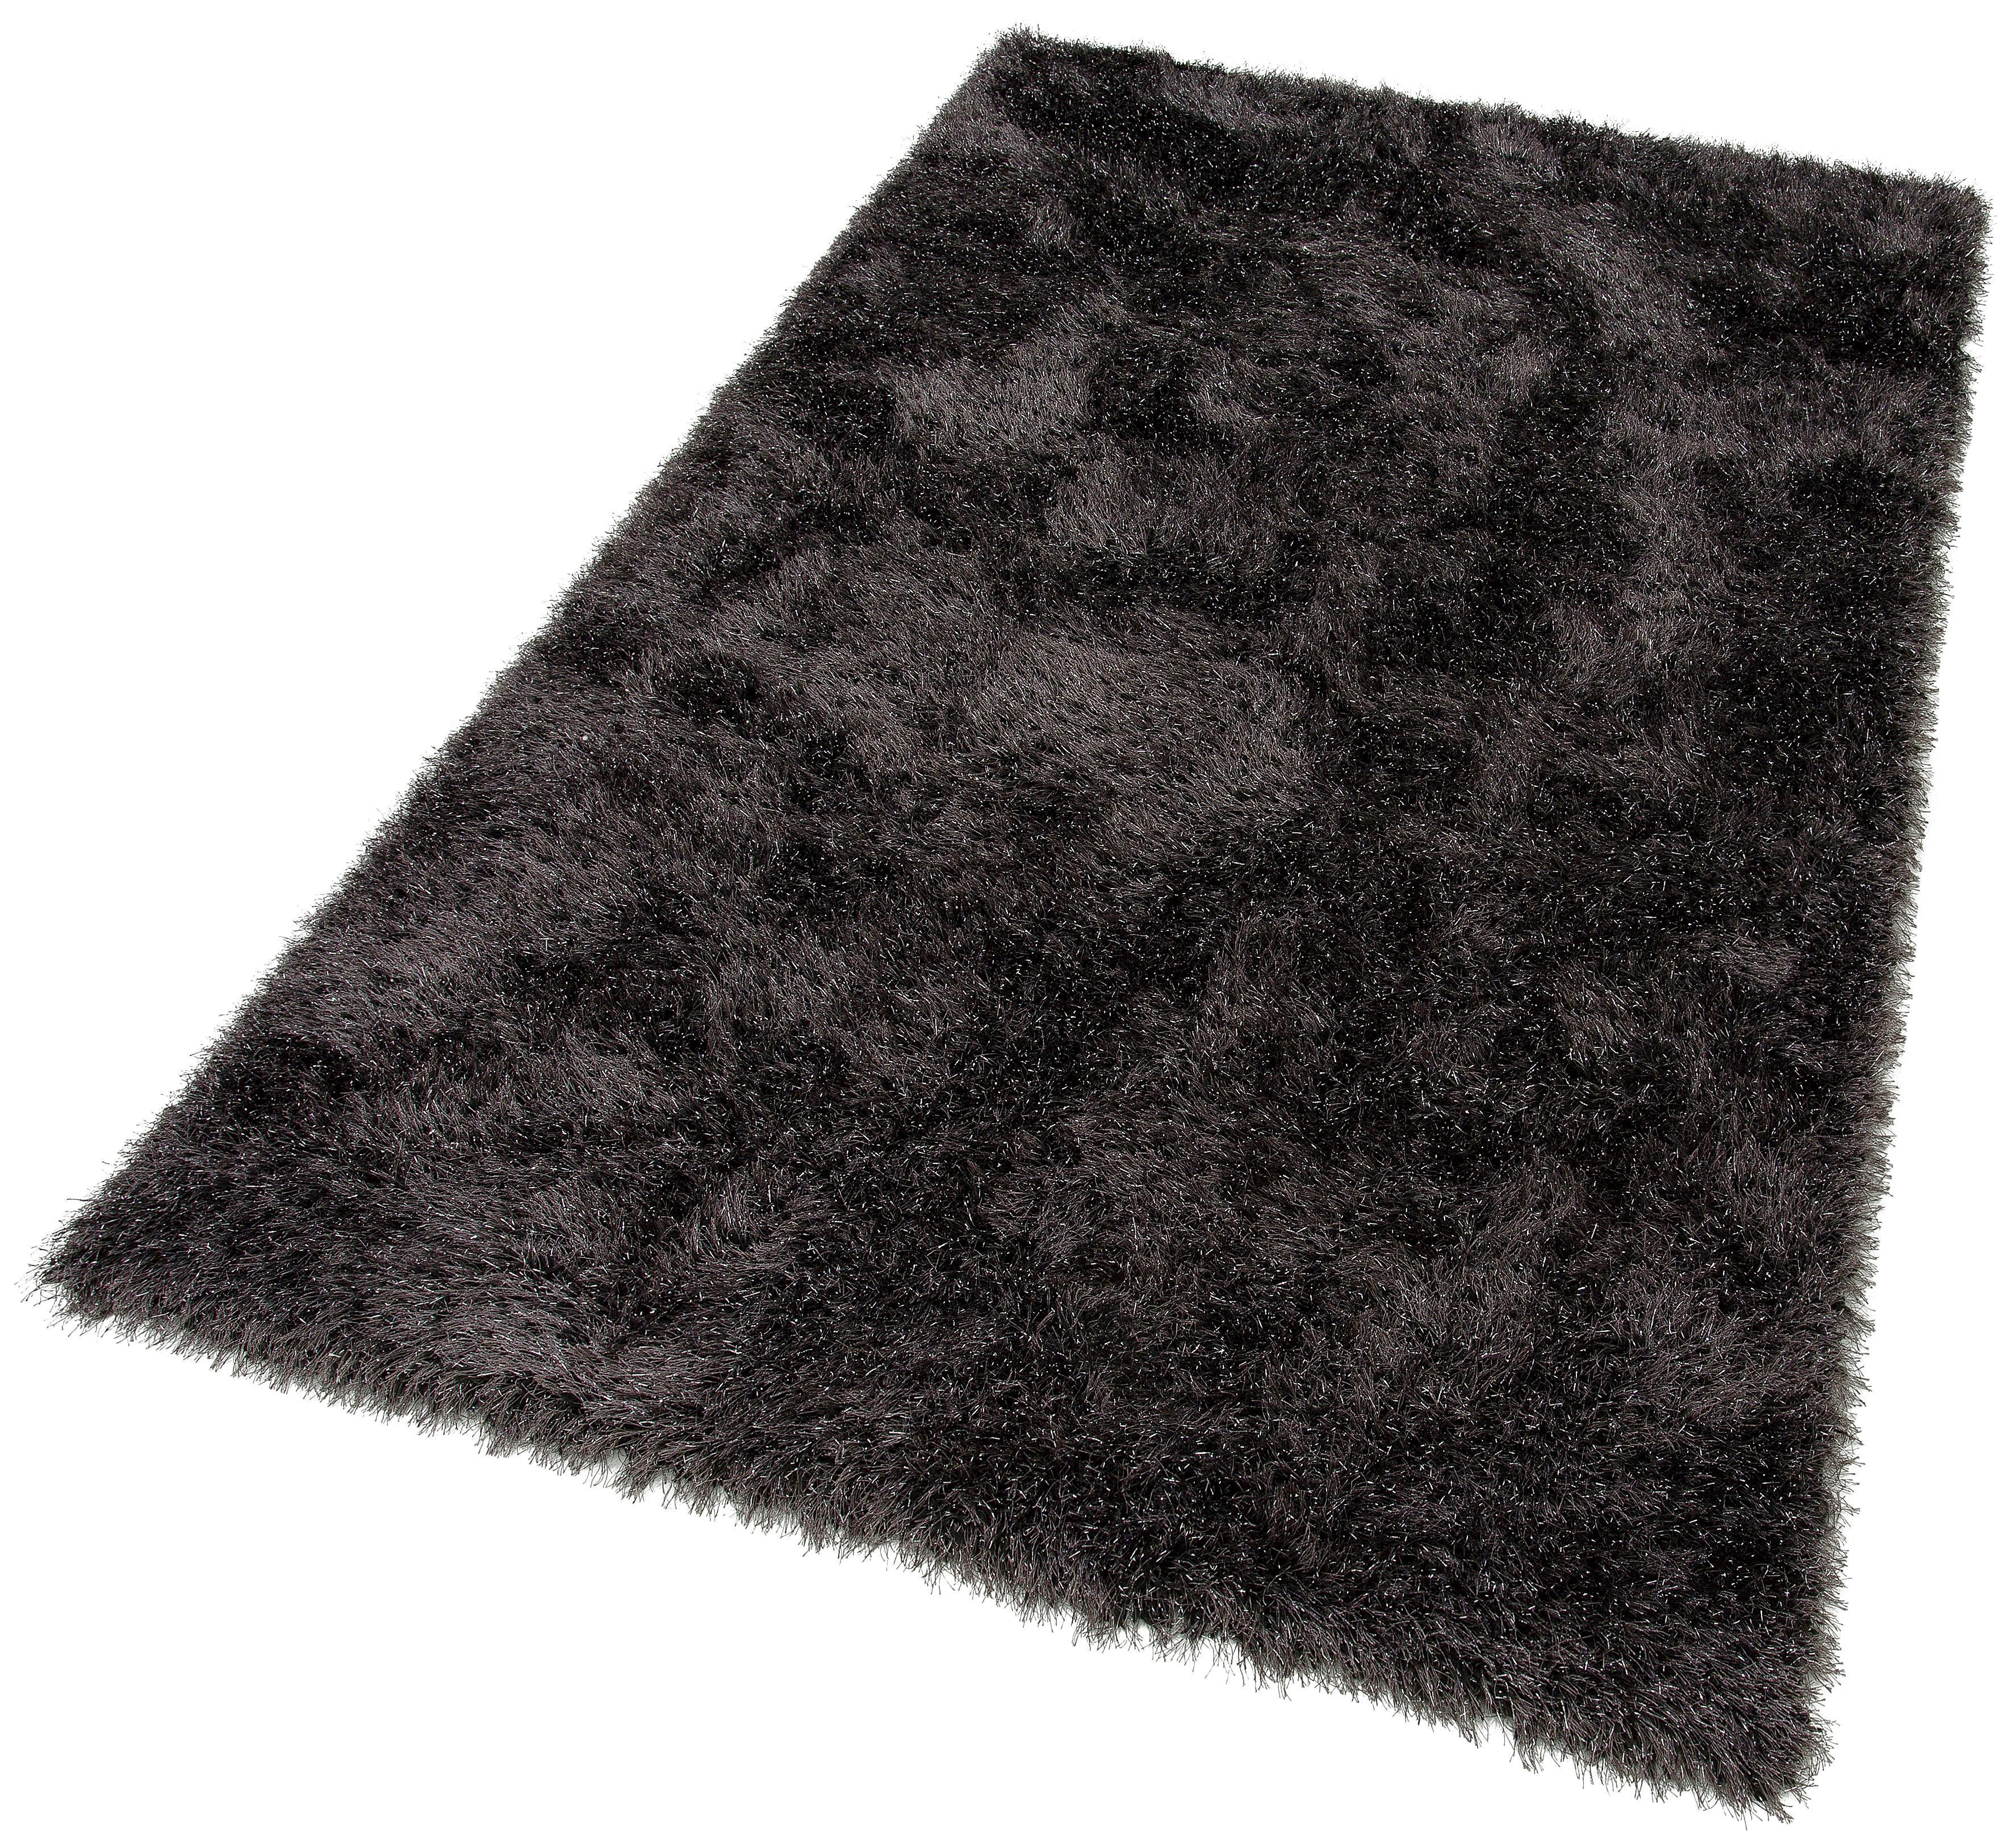 Hochflor-Teppich Glossy 411 merinos rechteckig Höhe 70 mm maschinell gewebt